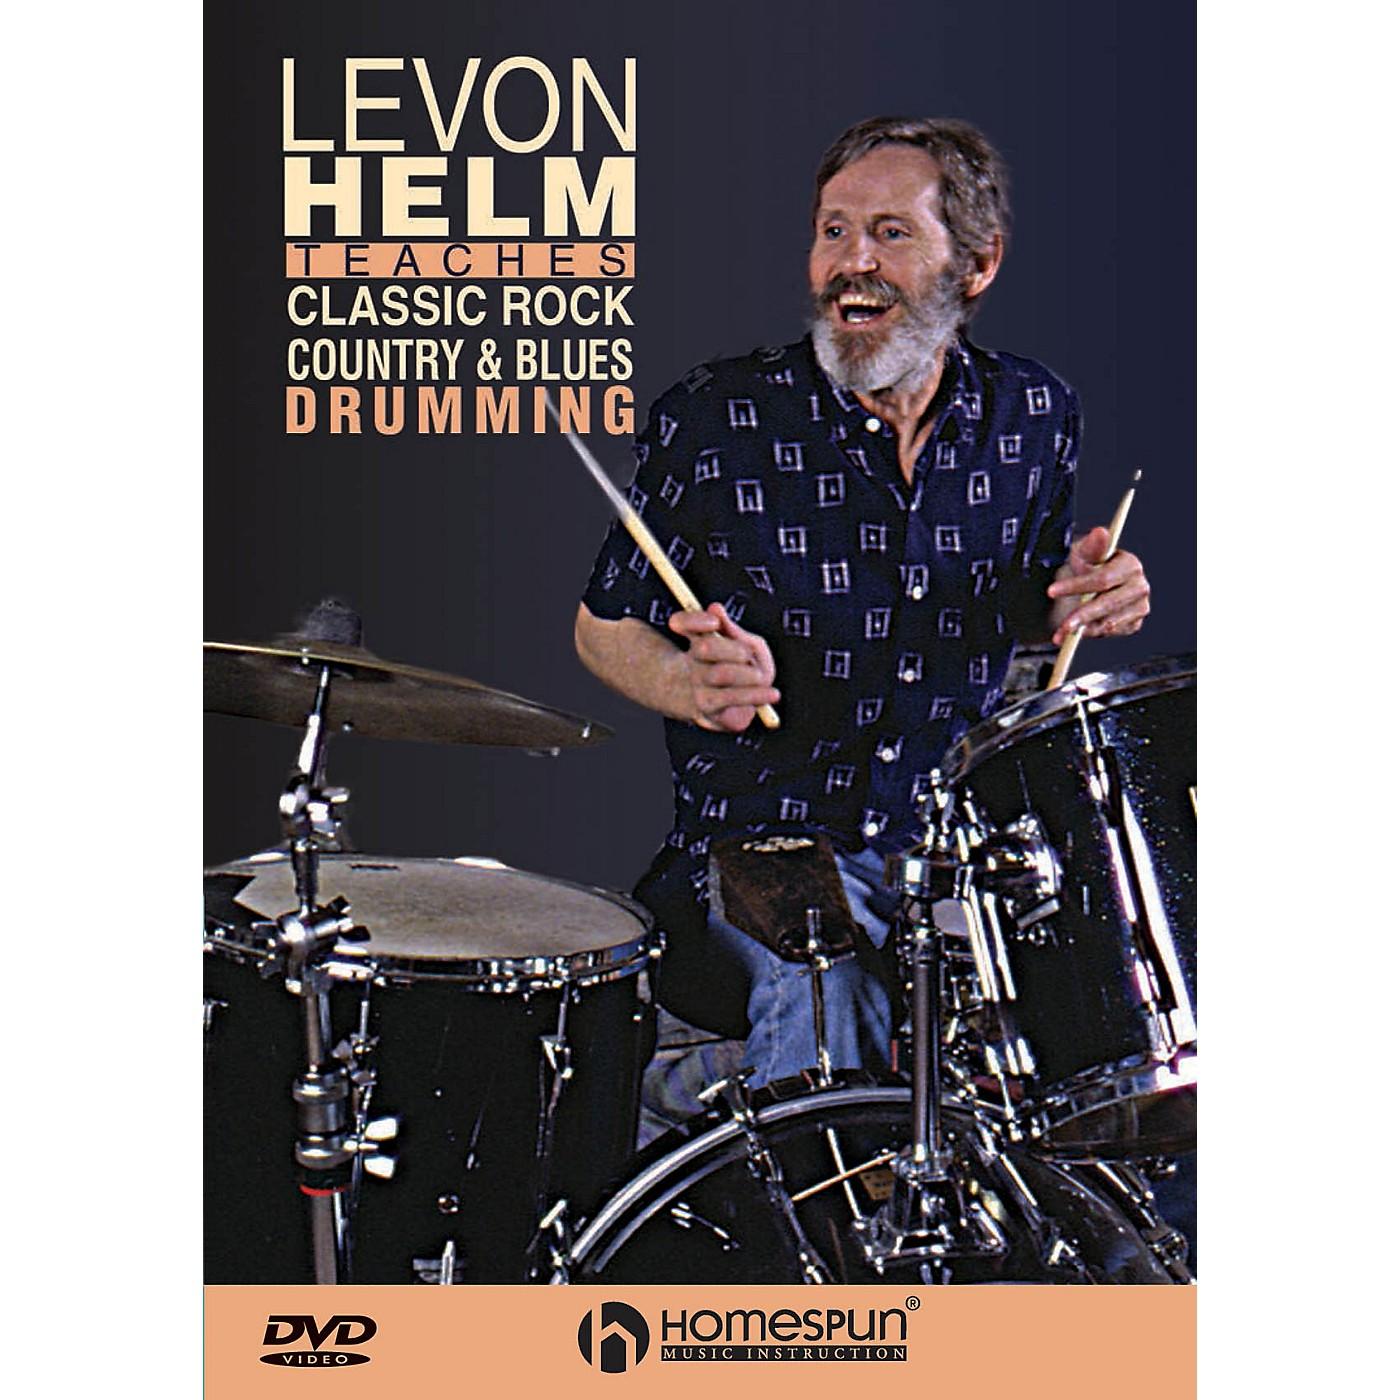 Homespun Classic Rock, Country & Blues Drumming Instructional/Drum/DVD Series DVD Written by Levon Helm thumbnail